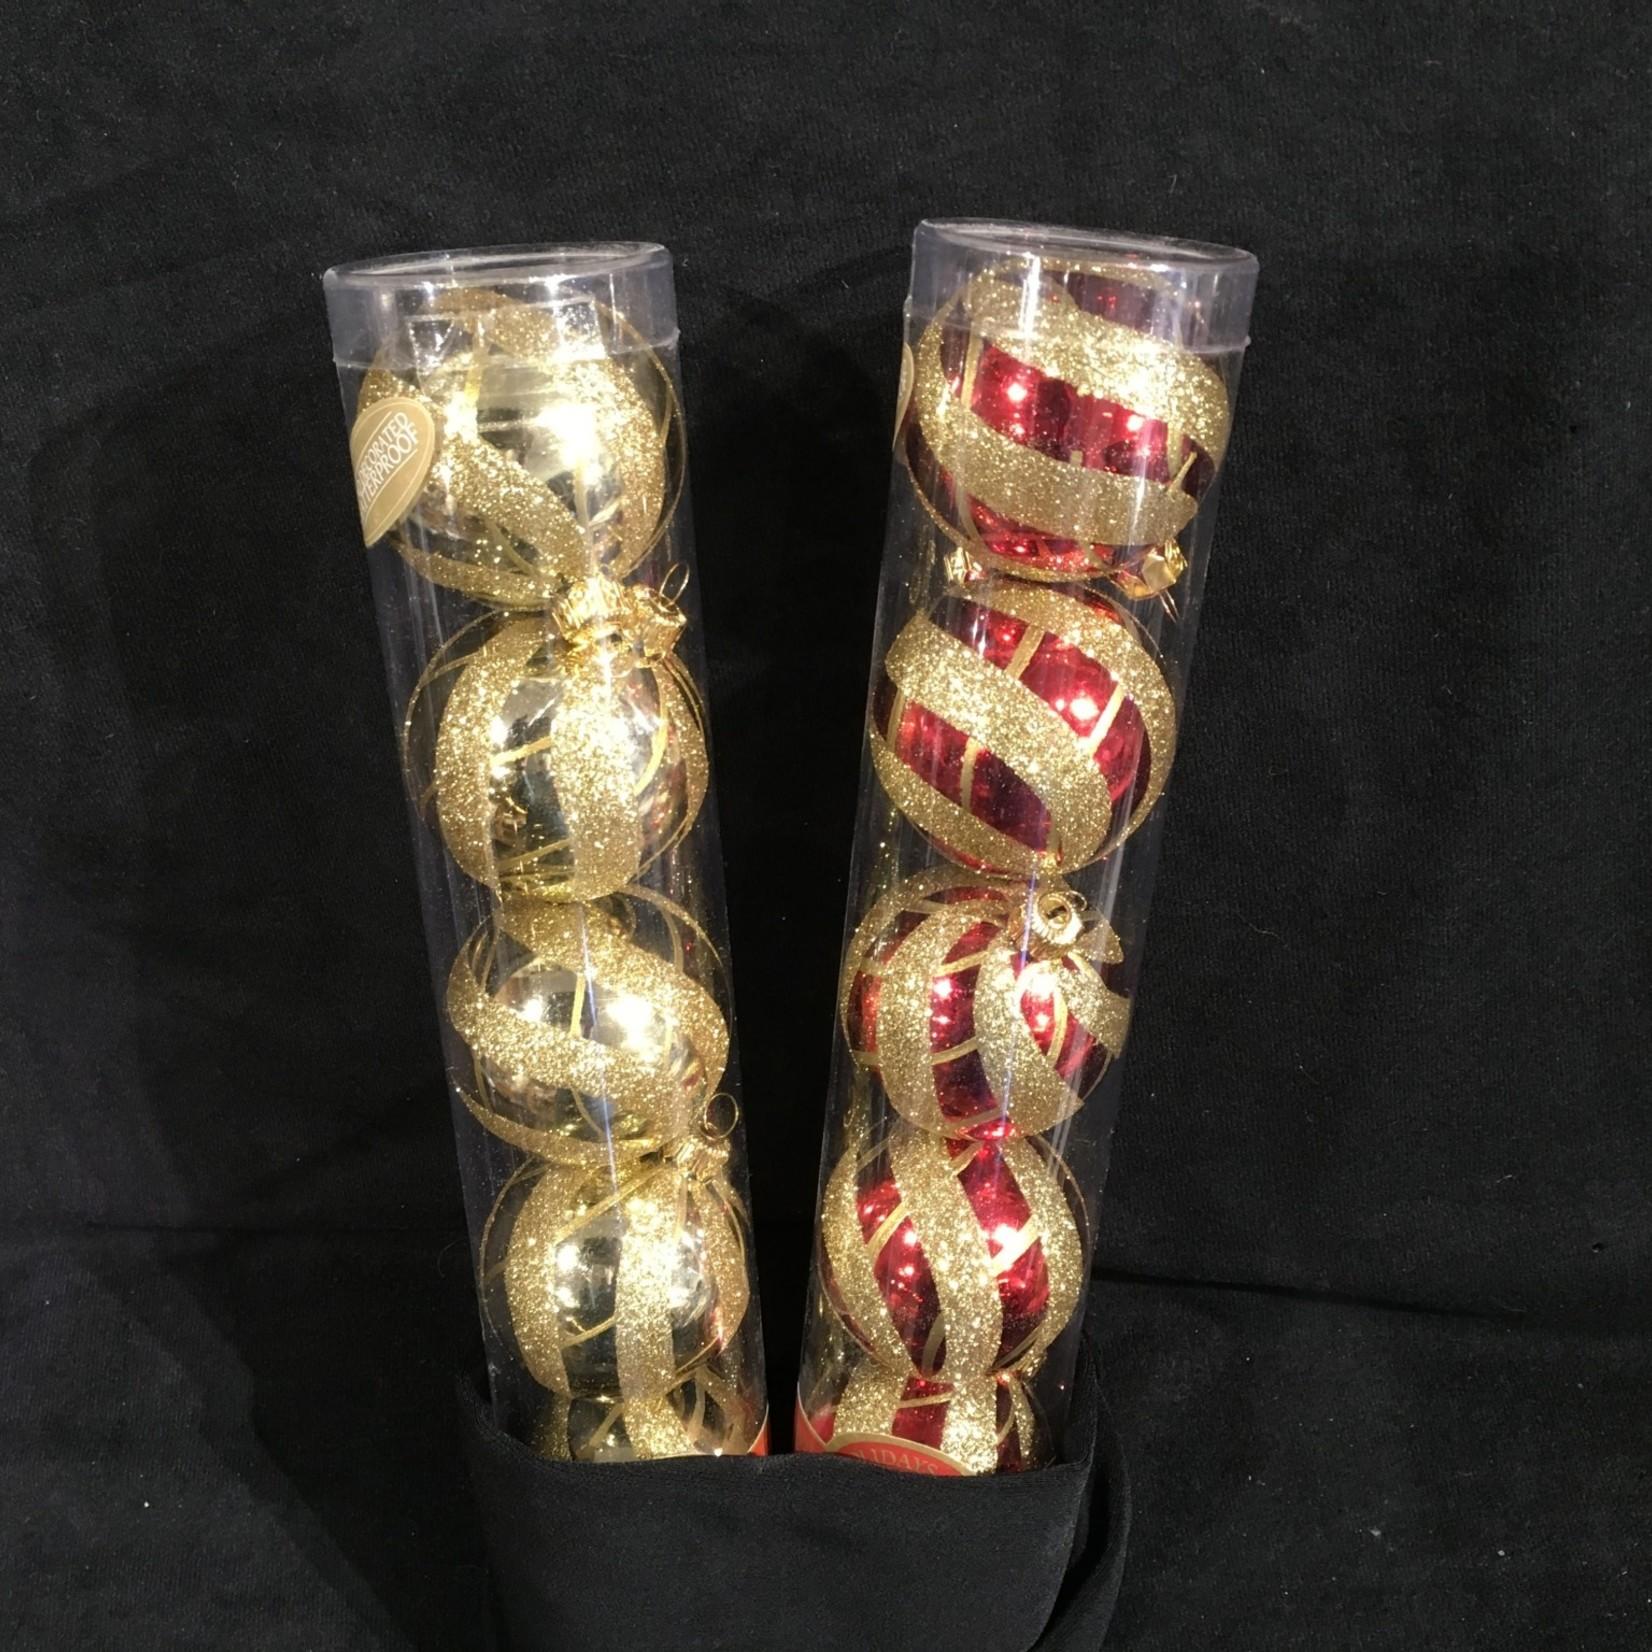 Shatterproof Deco Balls 5 pc